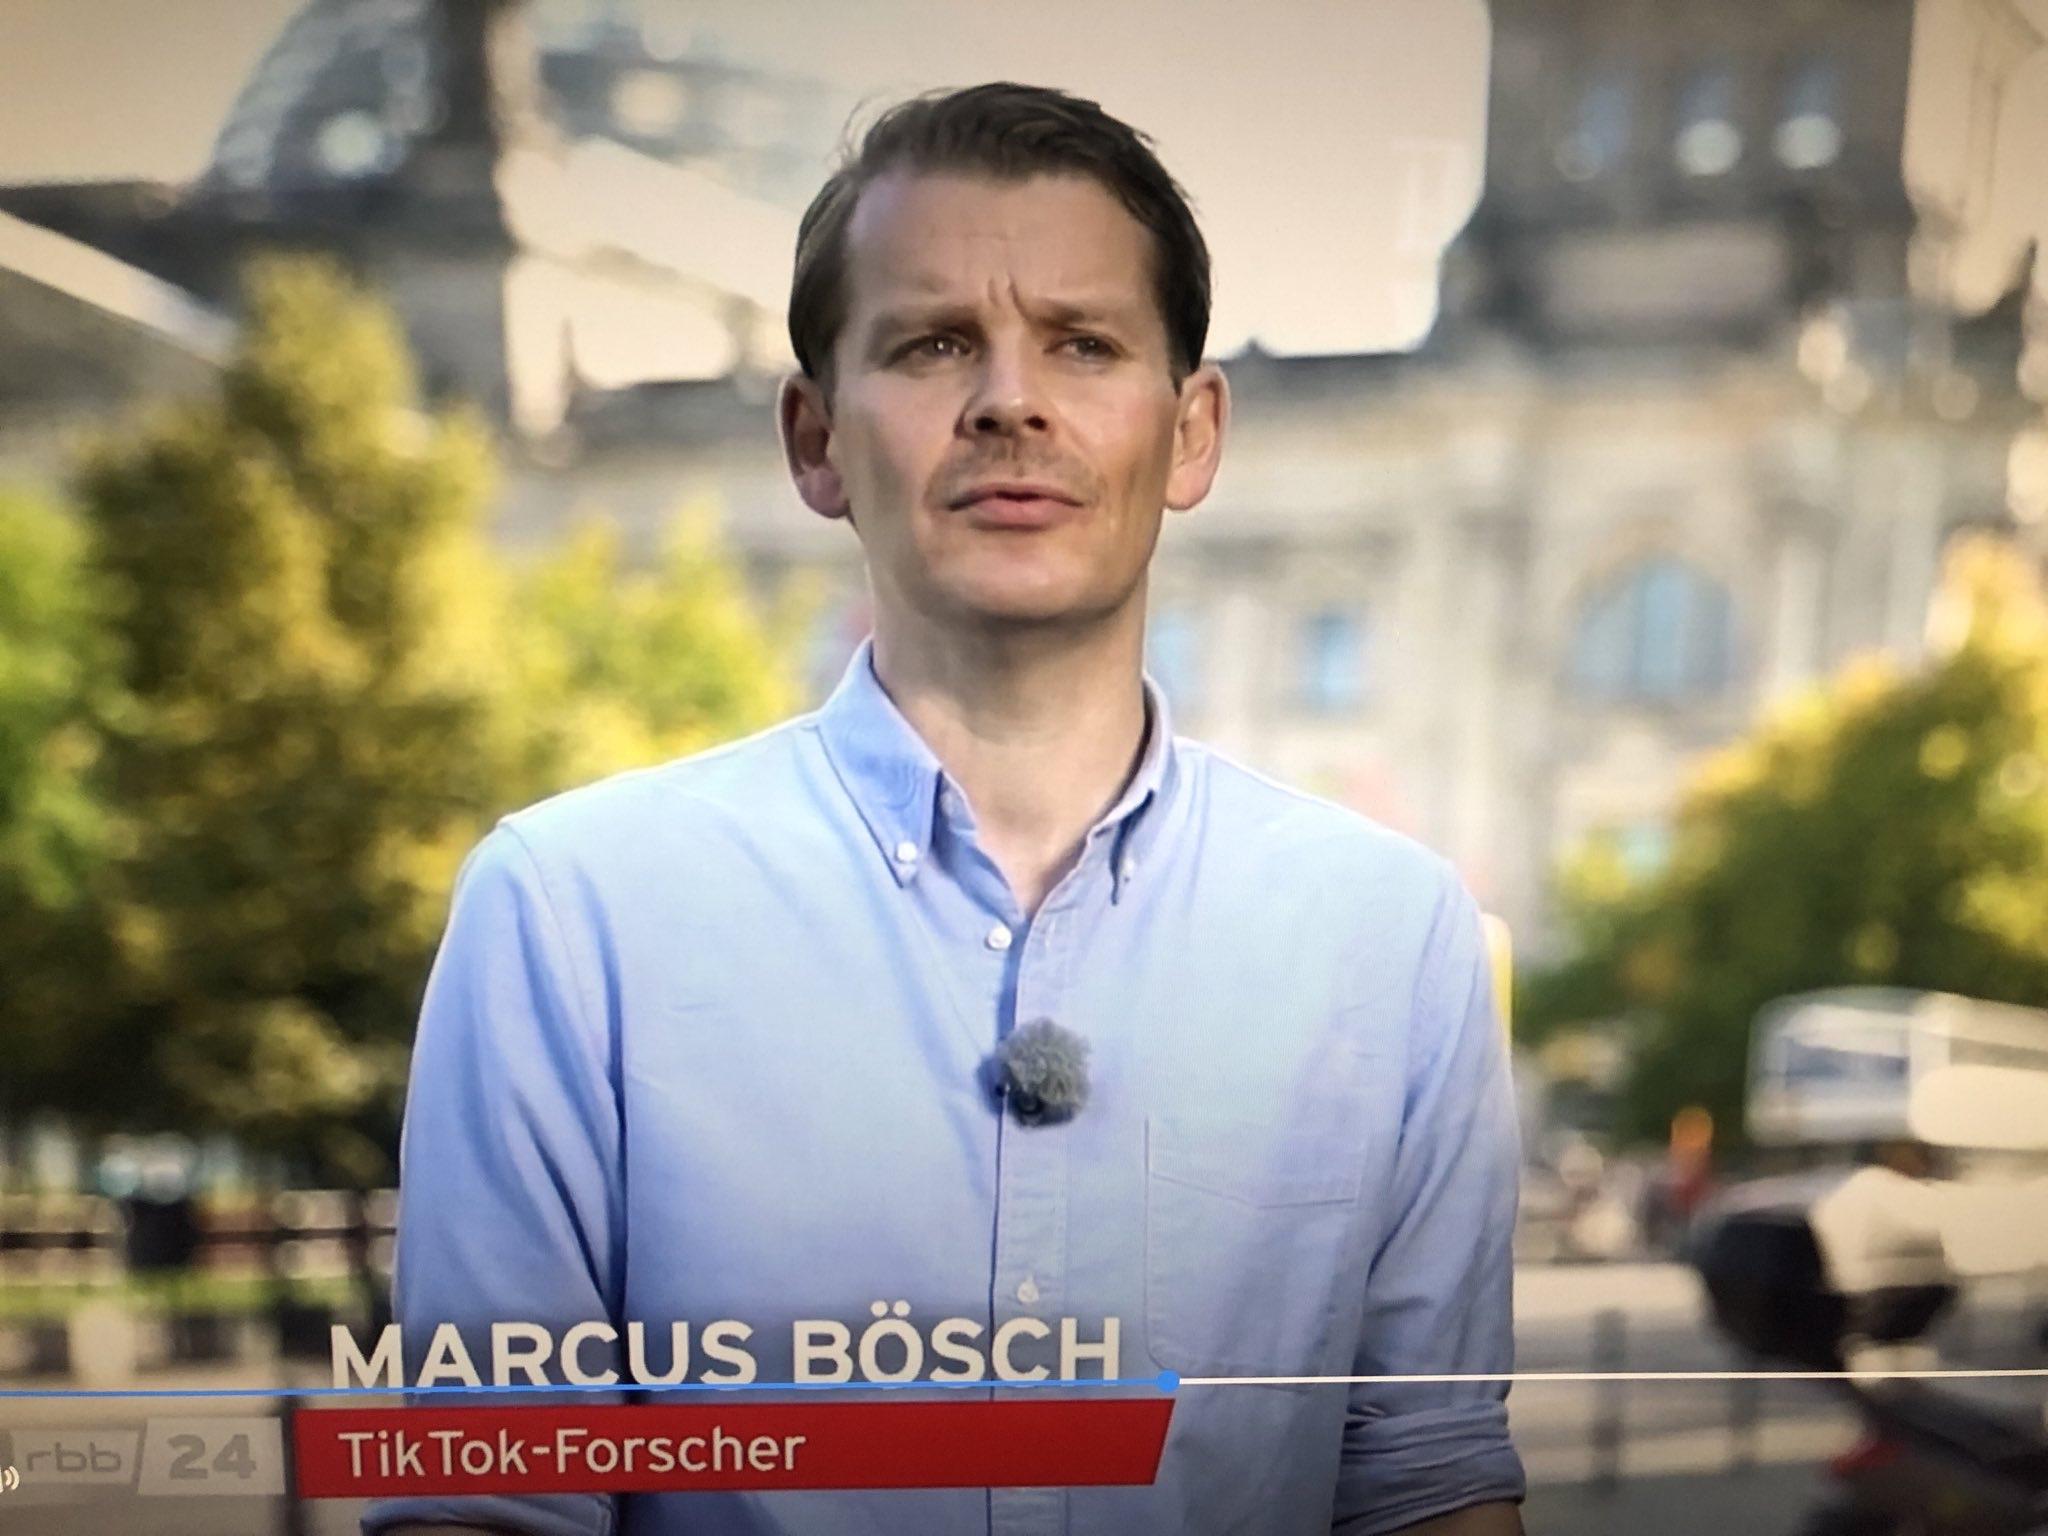 https://www.marcus-boesch.de/wp-content/uploads/2021/10/Image-1.jpg